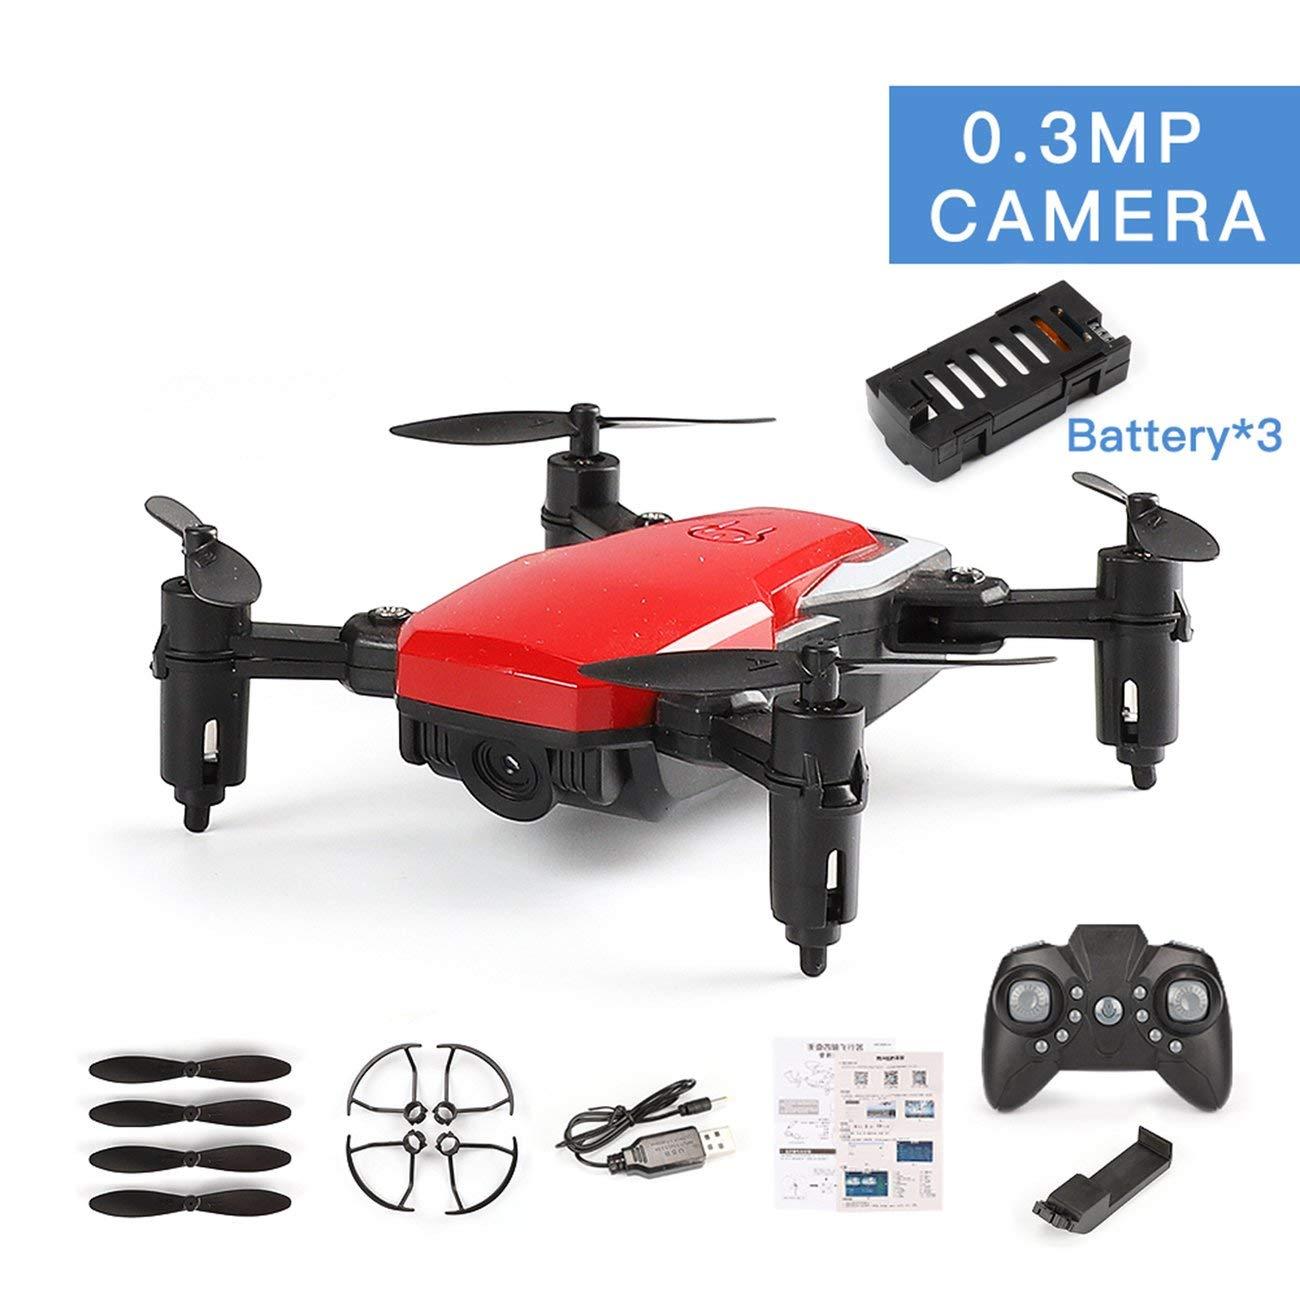 LF606 3 Batterien Drohne mit 0.3MP Kamera FPV Quadcopter Faltbare RC Drohnen Jiobapiongxin